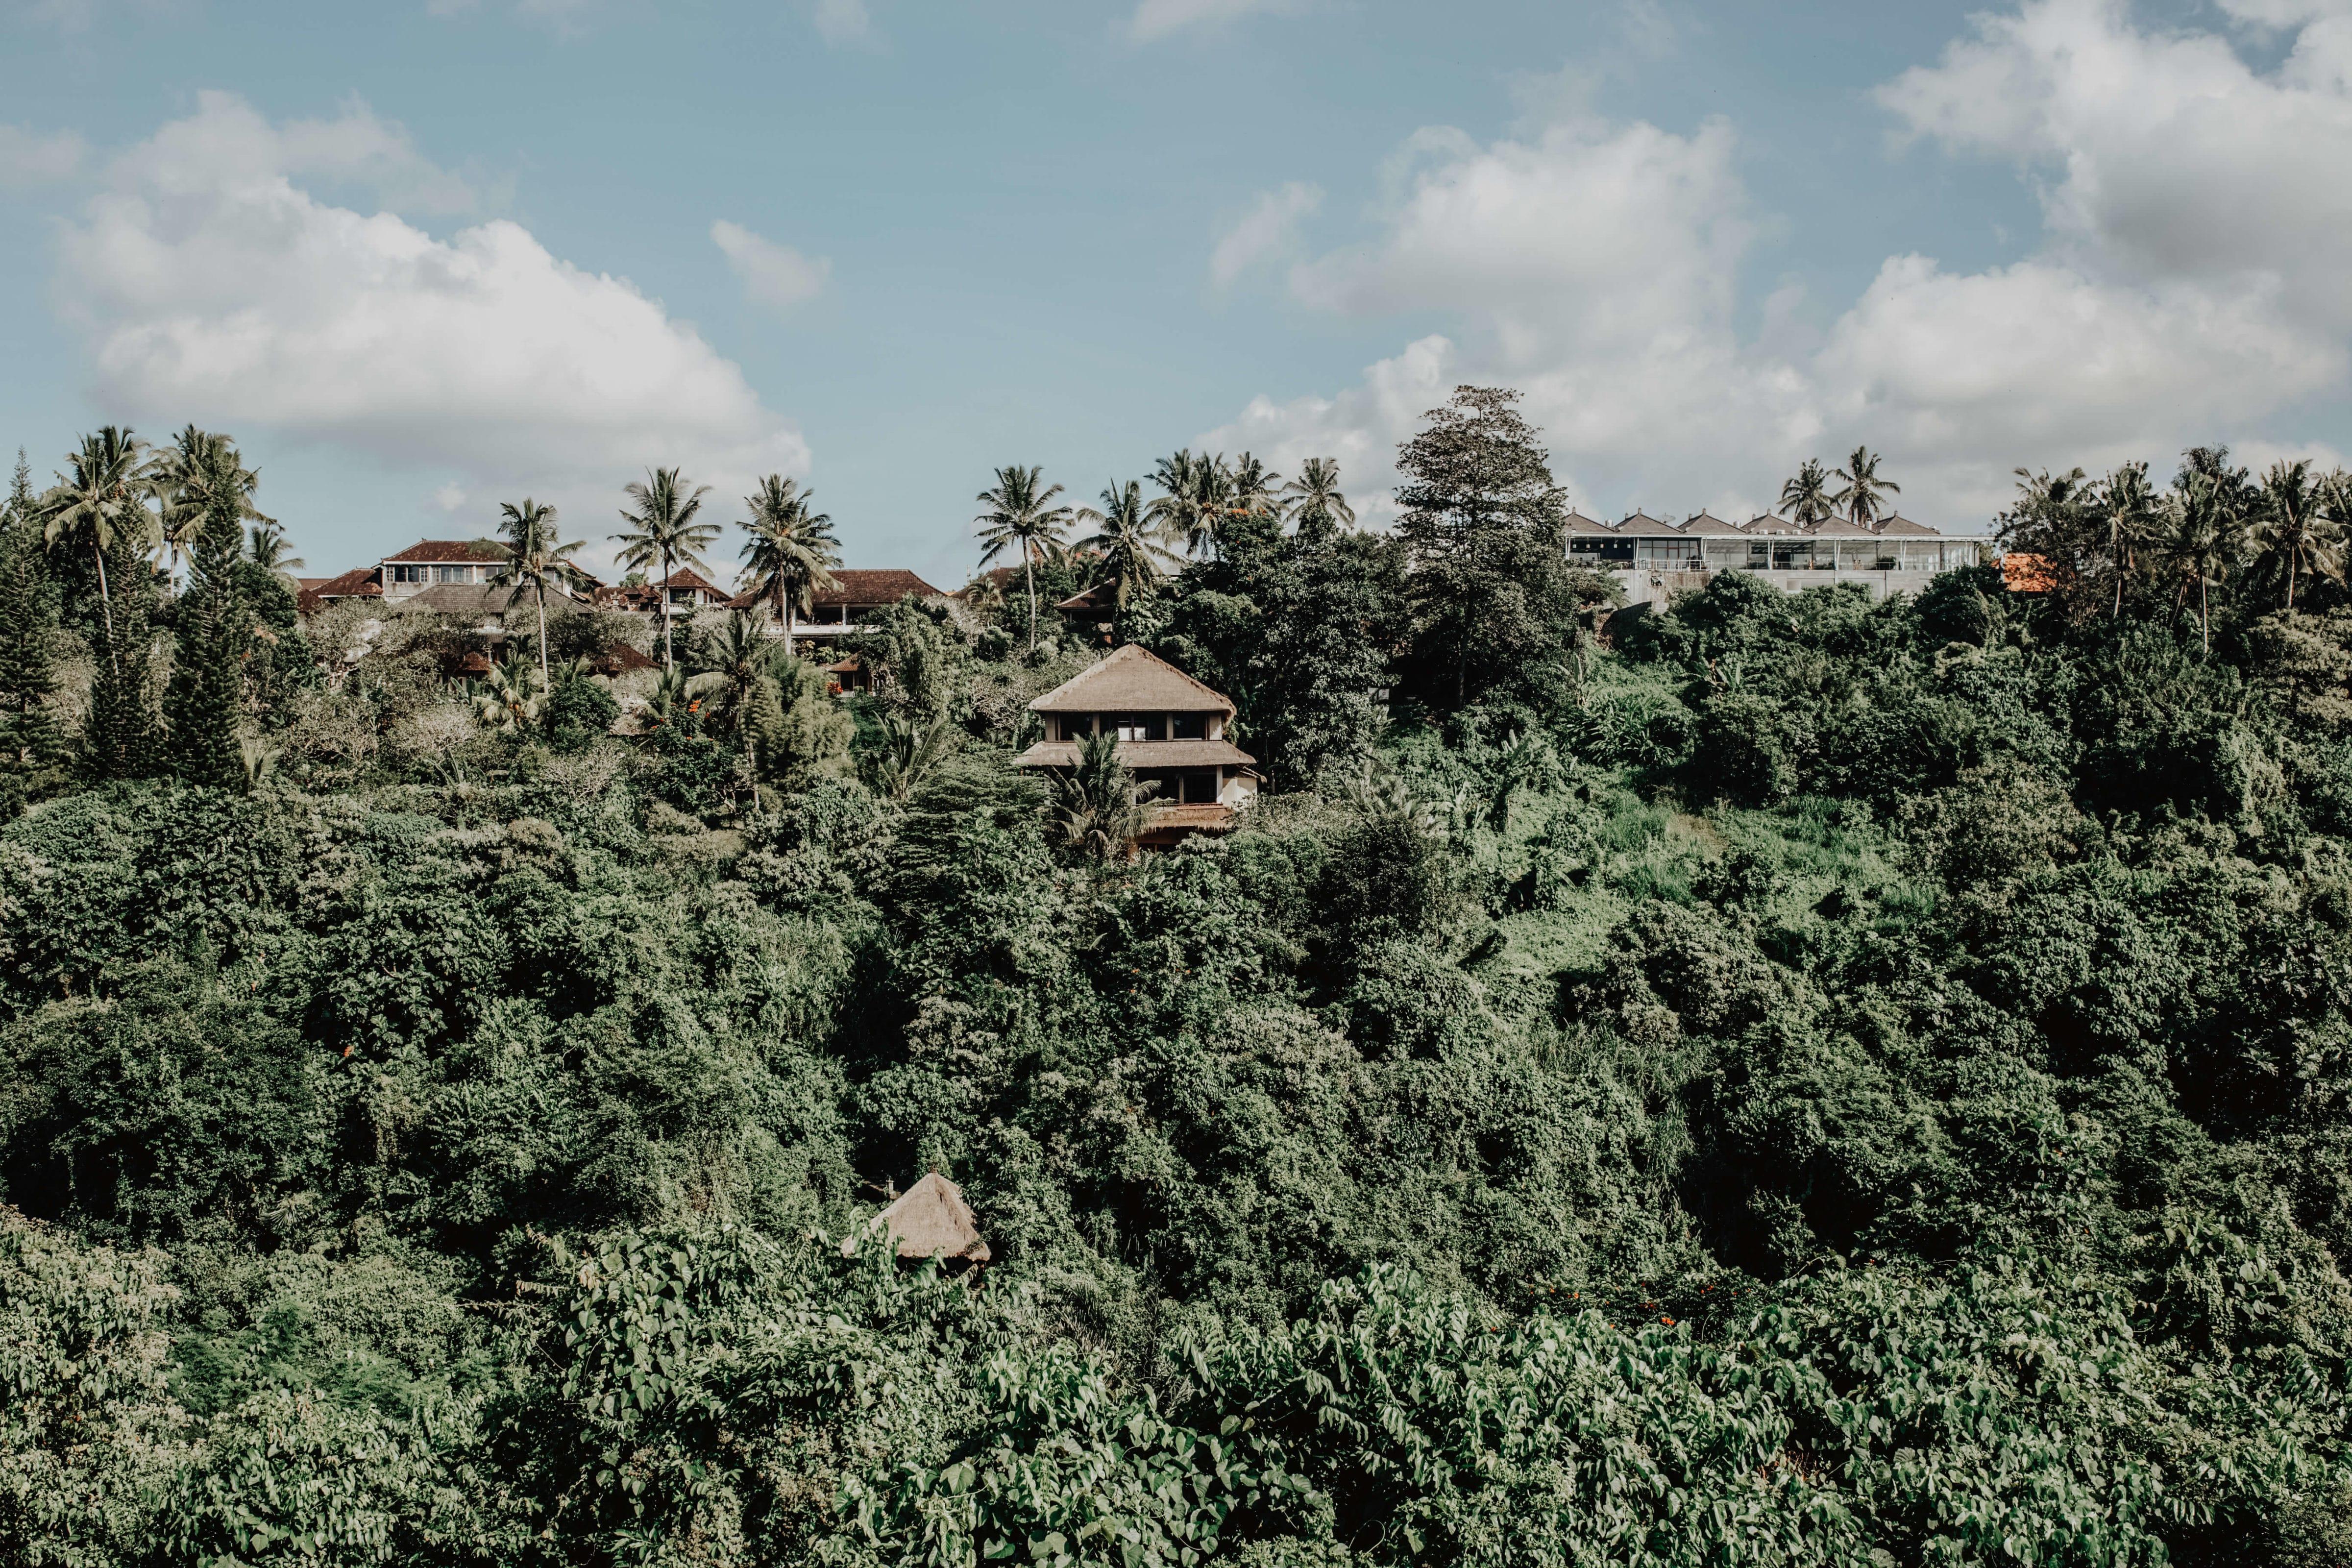 Travel photography Bali - Ubud - Campuhan Ridge walk - Panoramic view